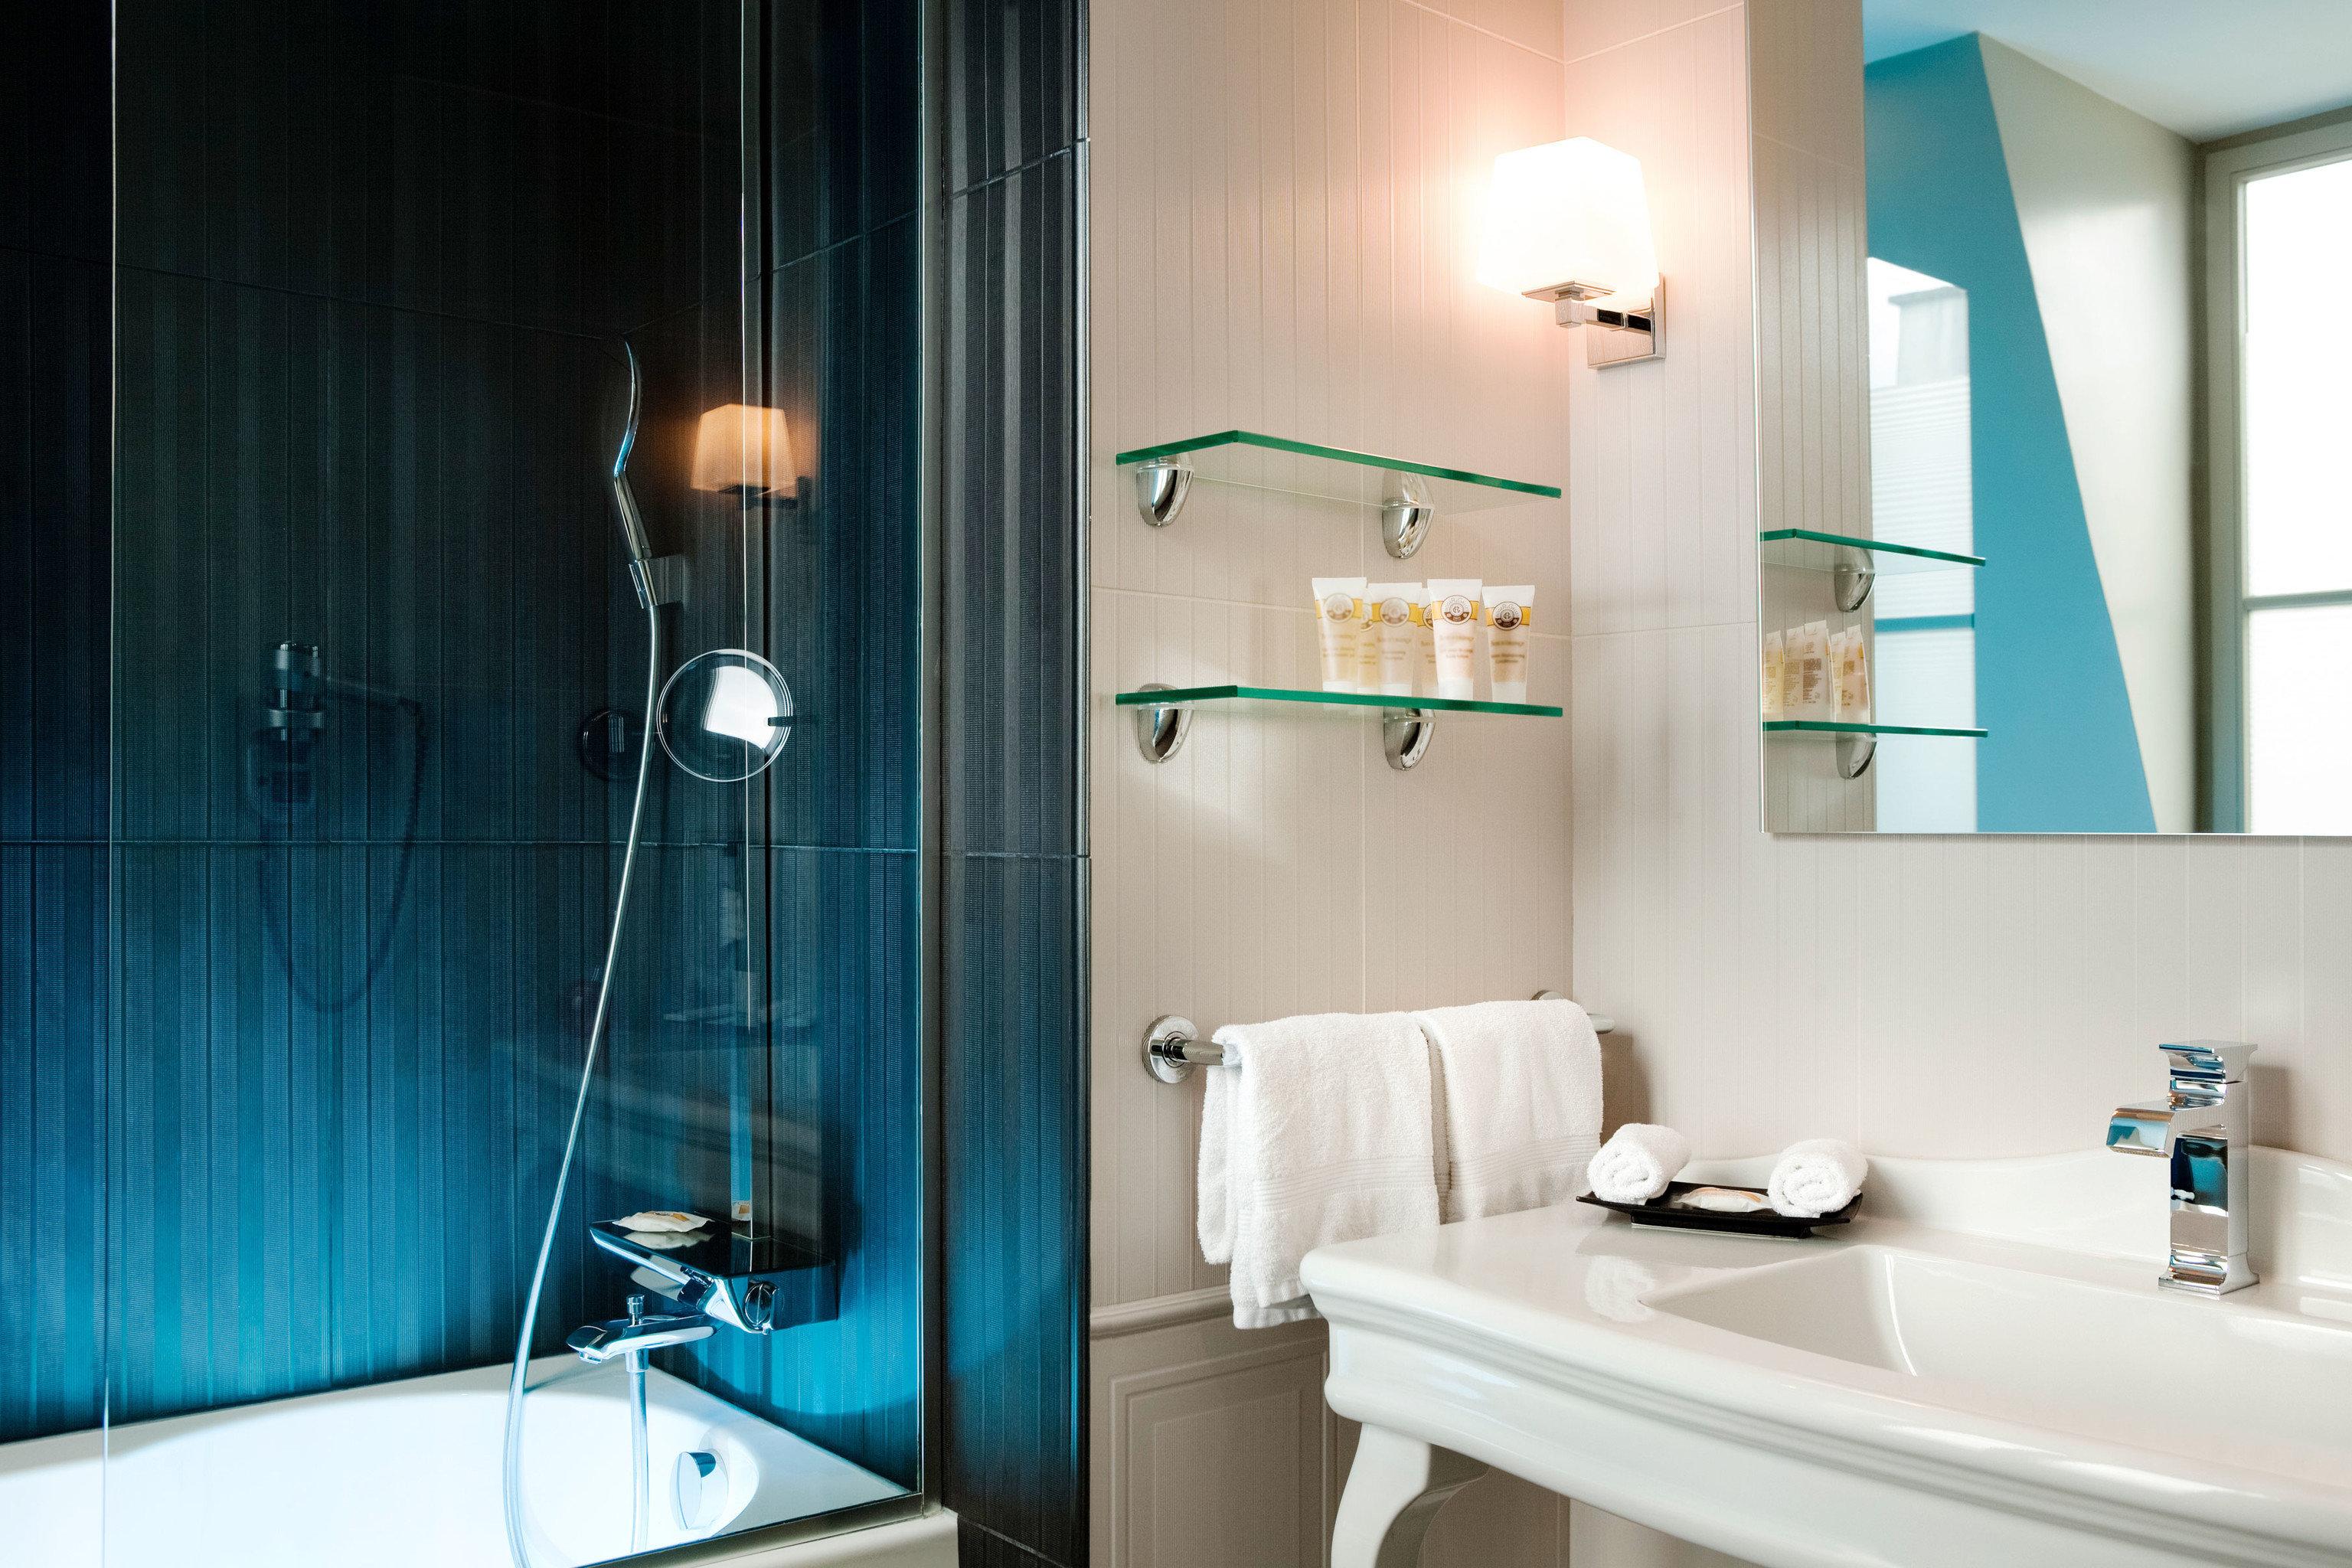 bathroom mirror sink lighting plumbing fixture light tub